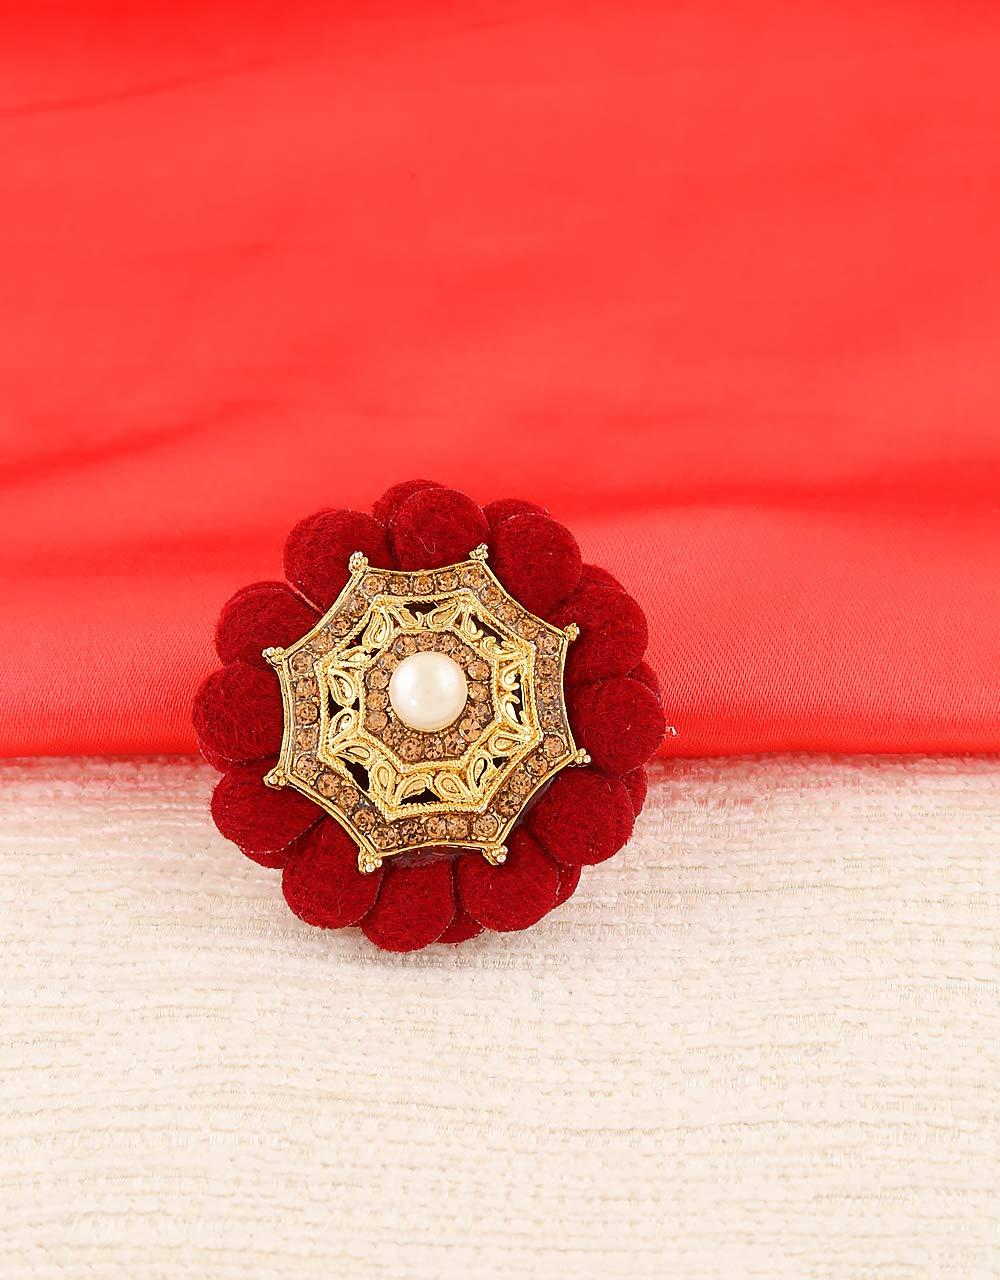 Anuradha Art Maroon Colour Flower Inspired Wonderful Sari/Saree Pin for Women/Girls by Anuradha Art (Image #2)